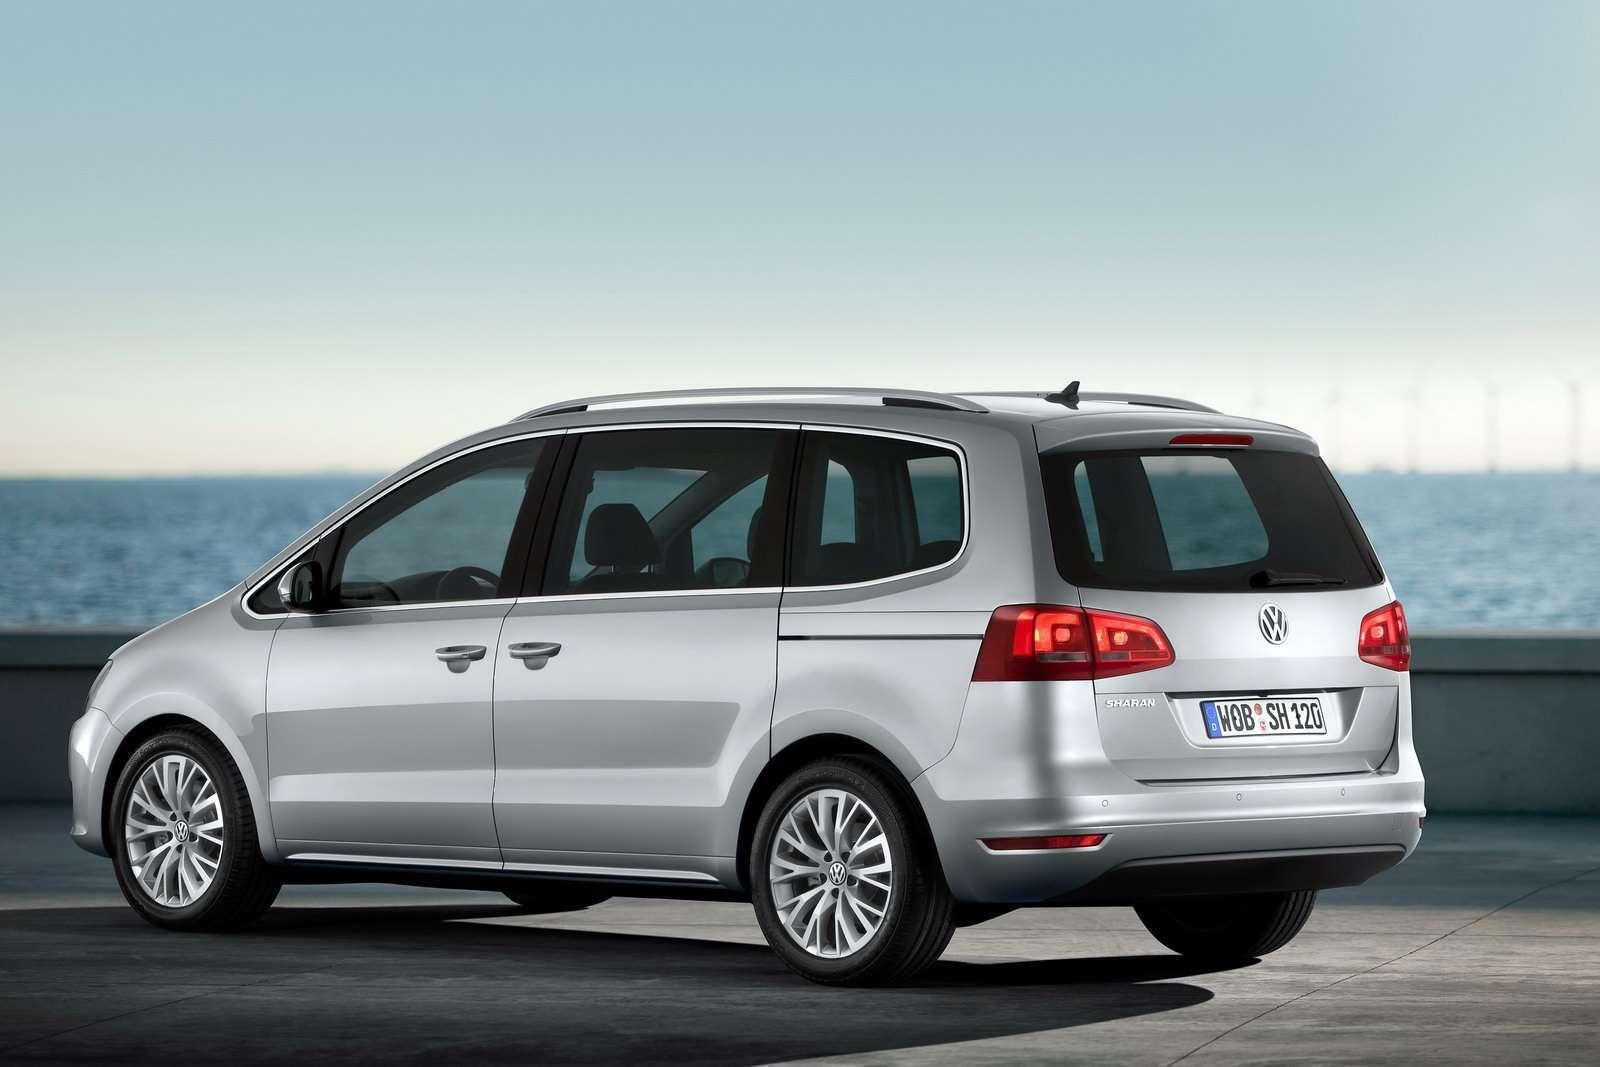 VW Sharan 2011 first oficcial photo 2010